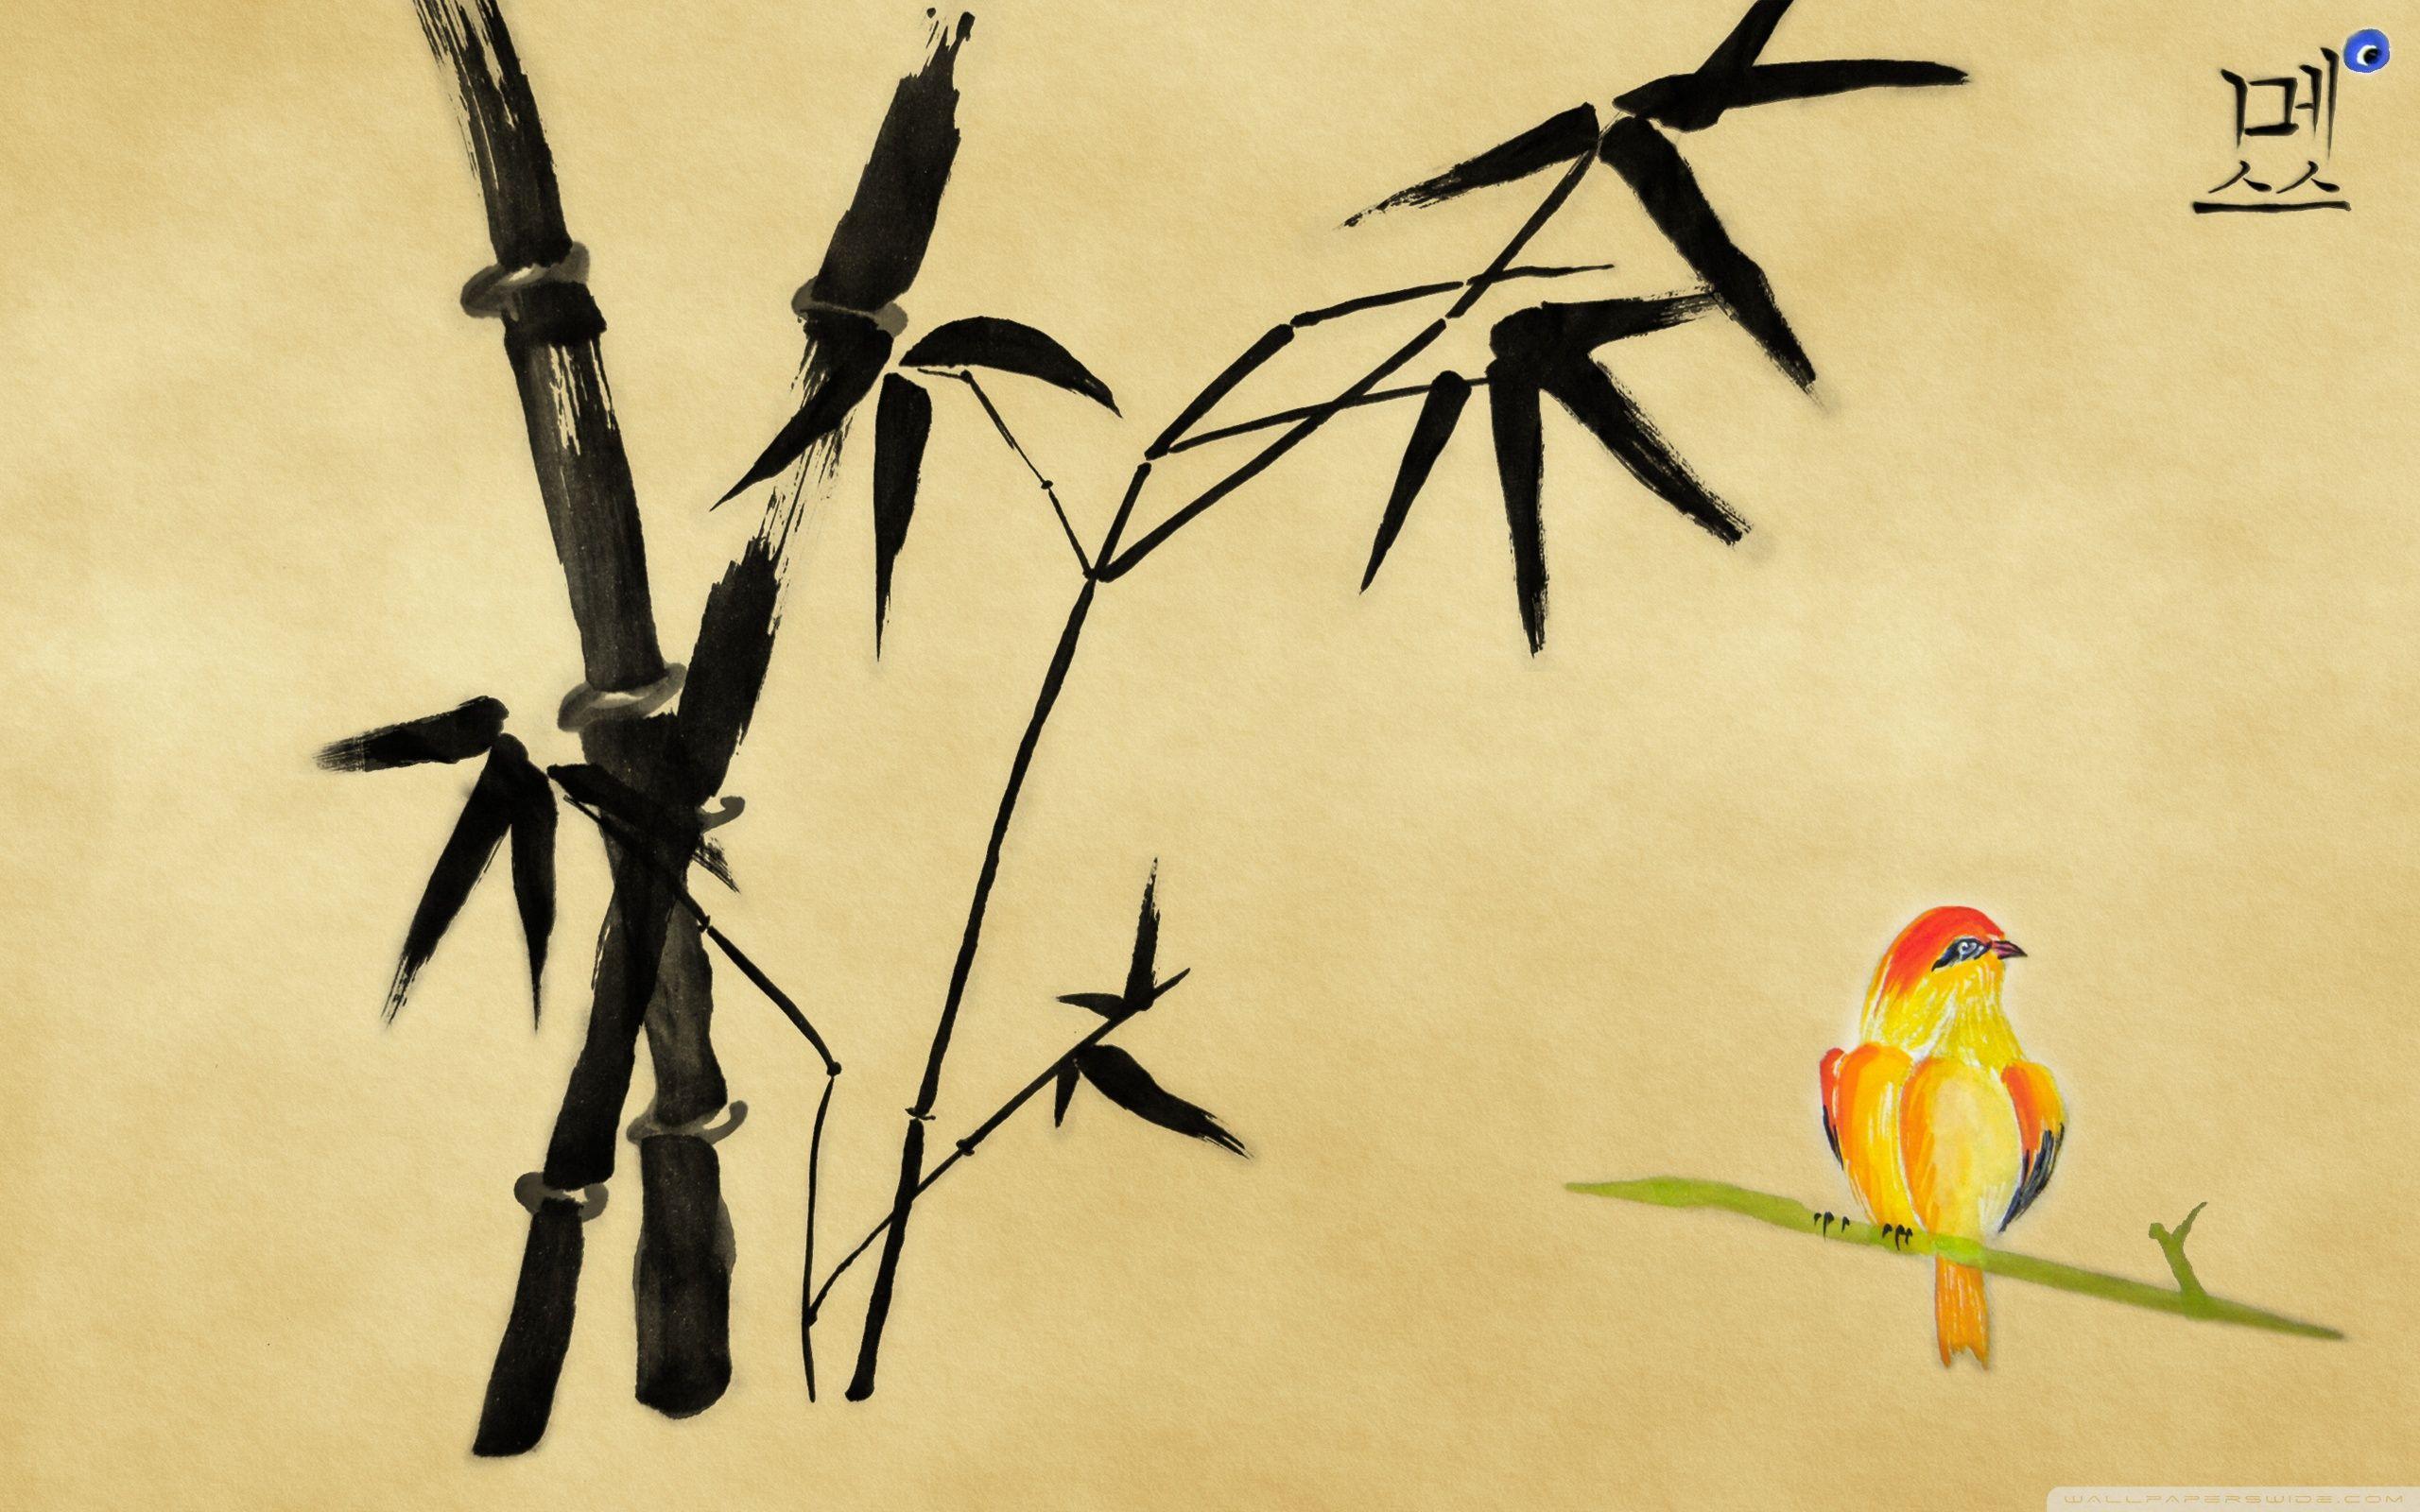 58474a51a950b6 2560x1600 Chinese Bird Painting ❤ 4K HD Desktop Wallpaper for • Dual Monitor  .